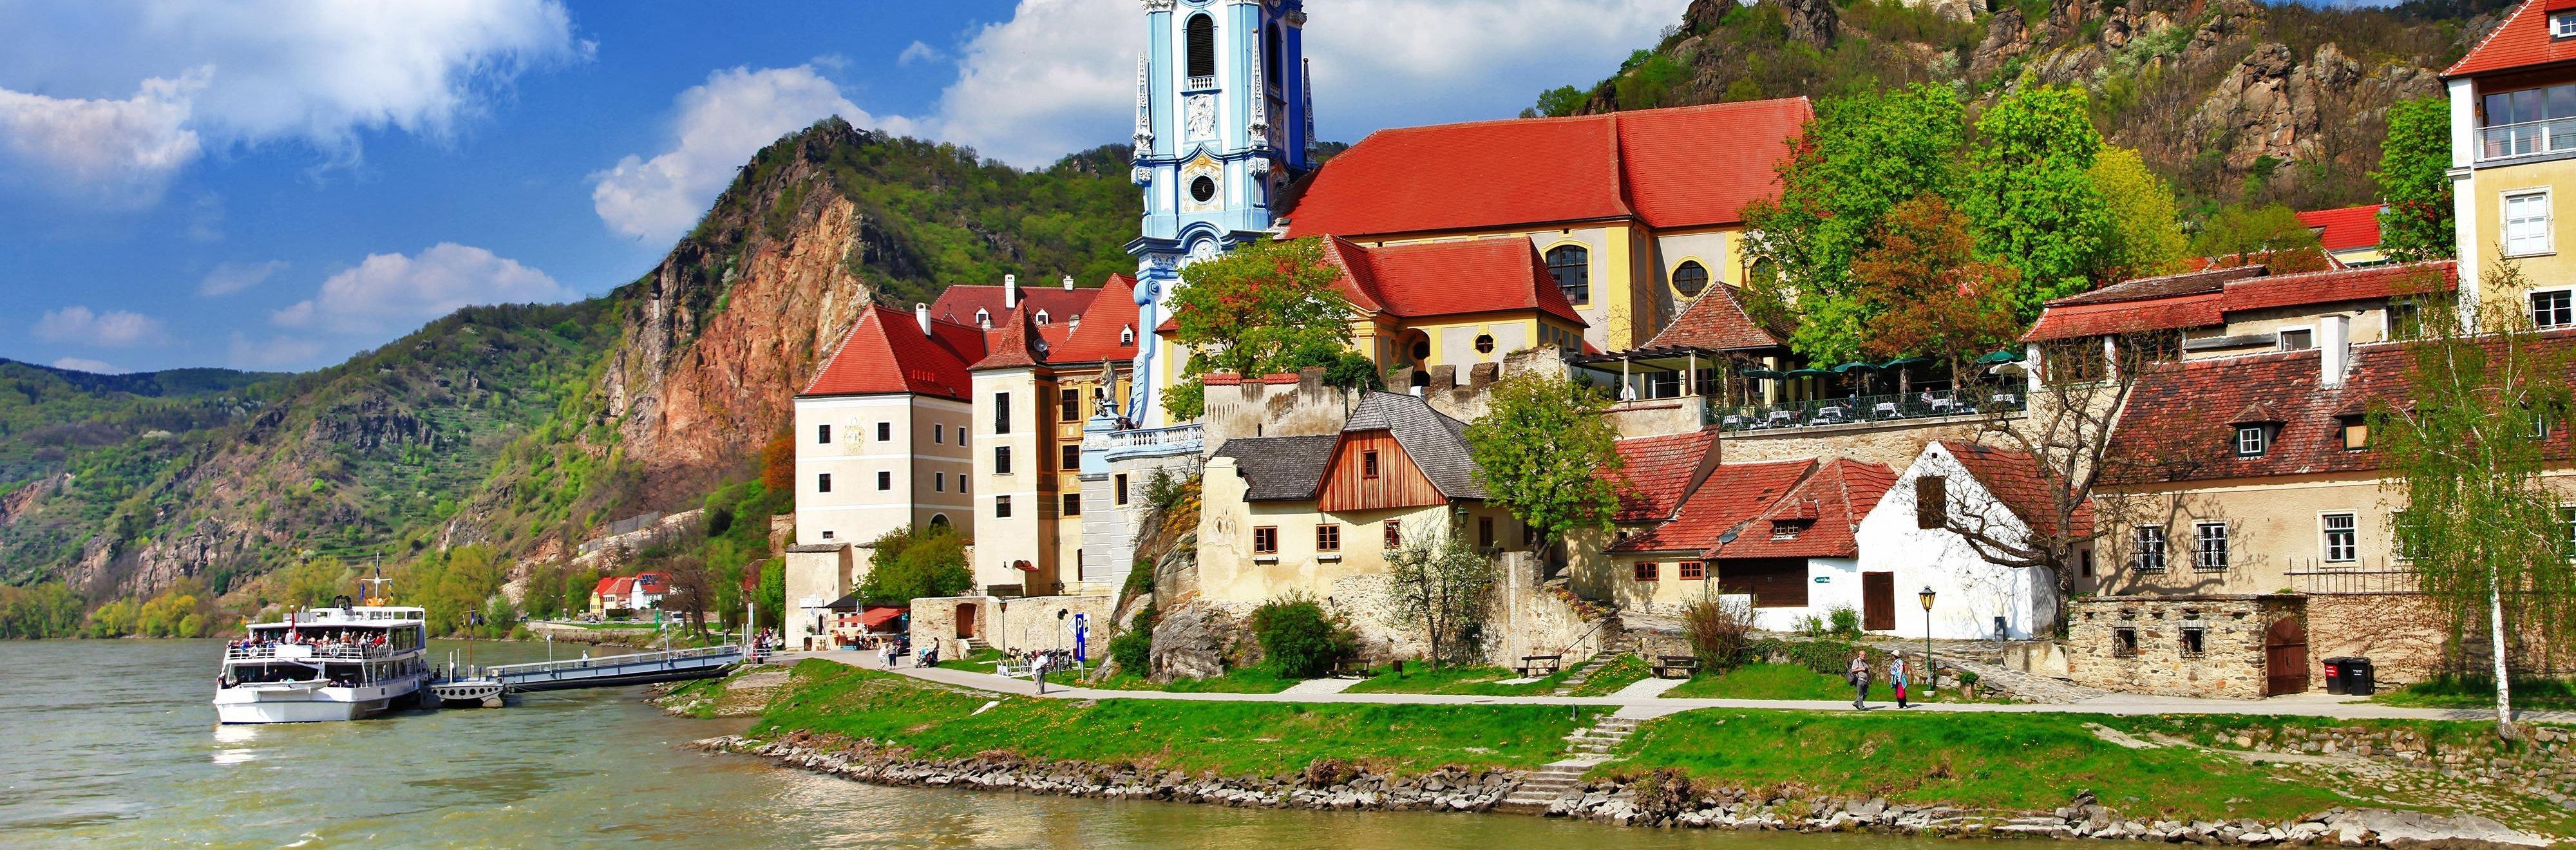 10-daagse fietsvakantie Passau - Wenen